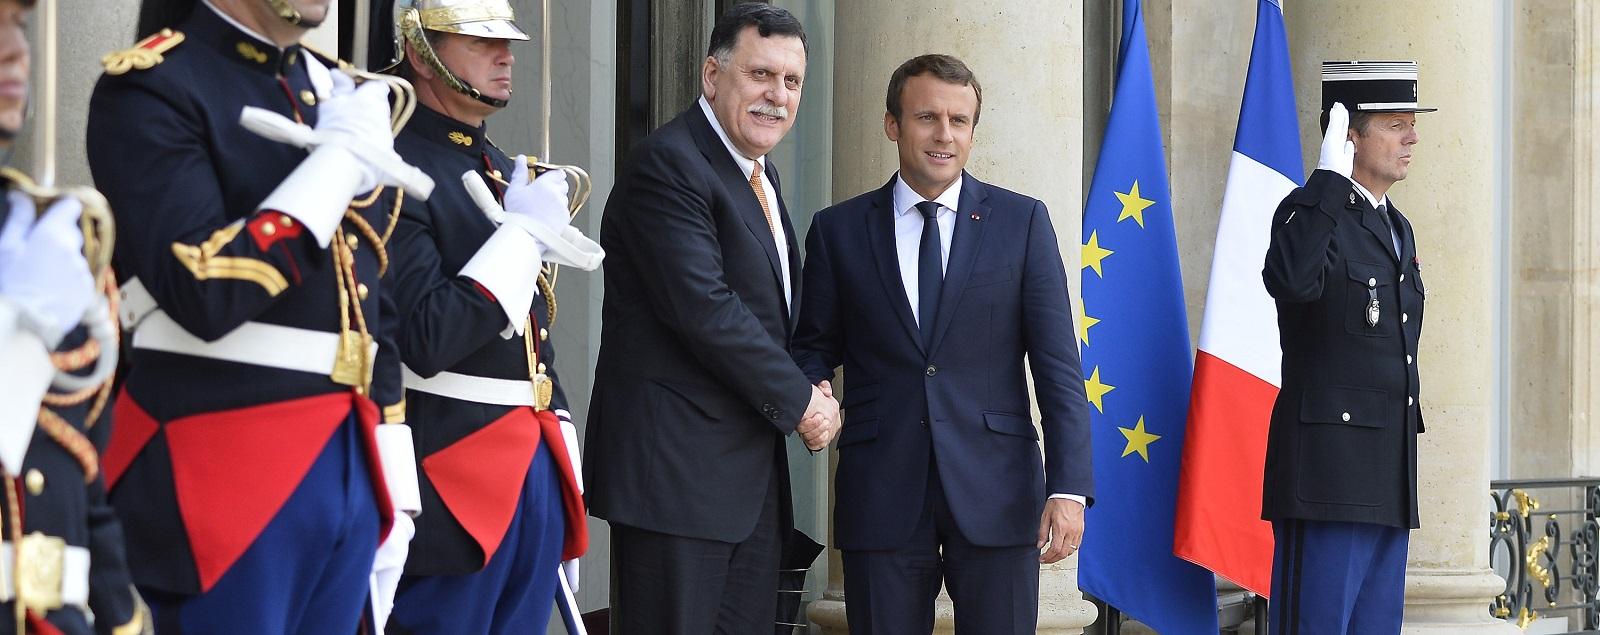 French President Emmanuel Macron with Fayez Al Serraj, PM of Libya's UN-backed government, on 28 August in Paris, France. (Photo: Aurelien Meunier/Getty Images)